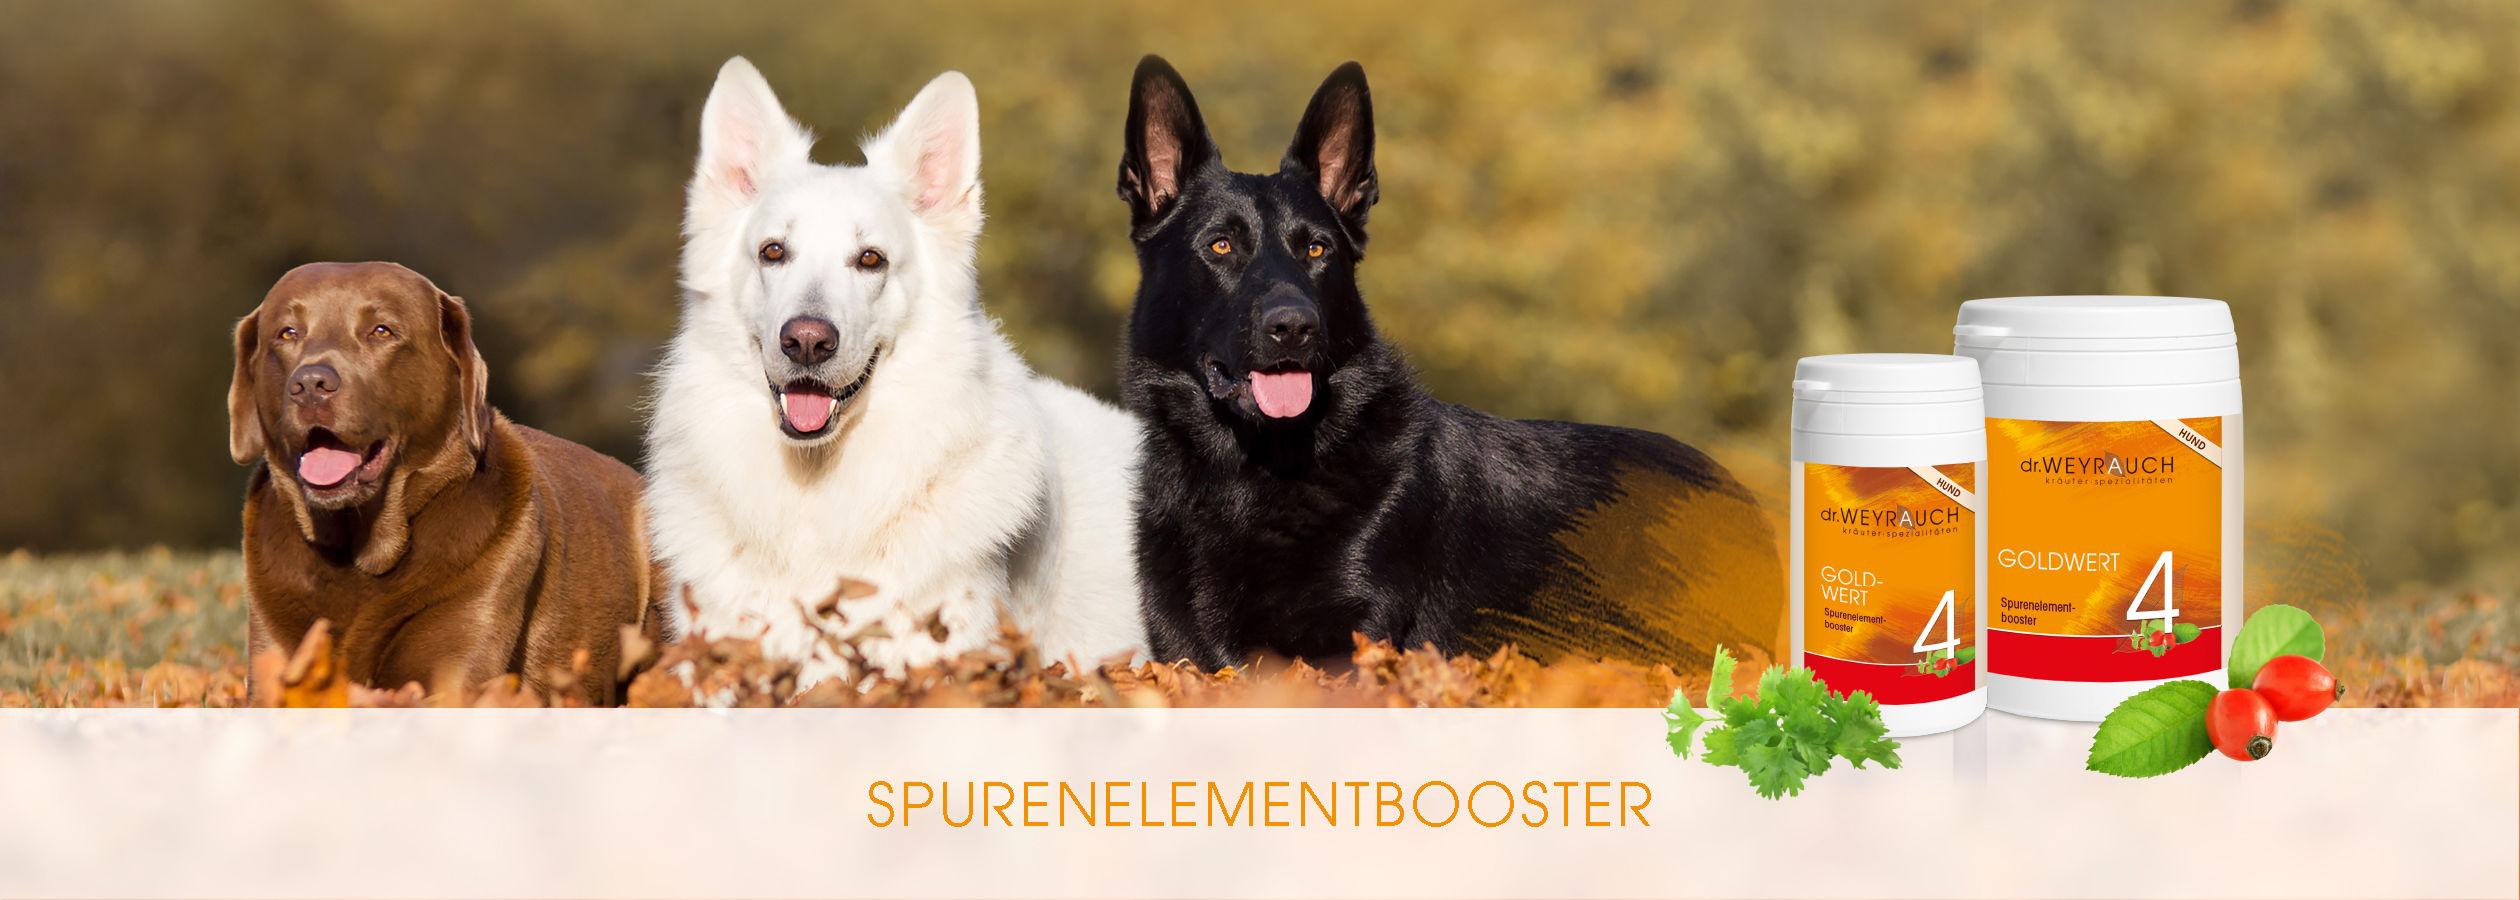 HEADER-2017-Goldwert-Hund